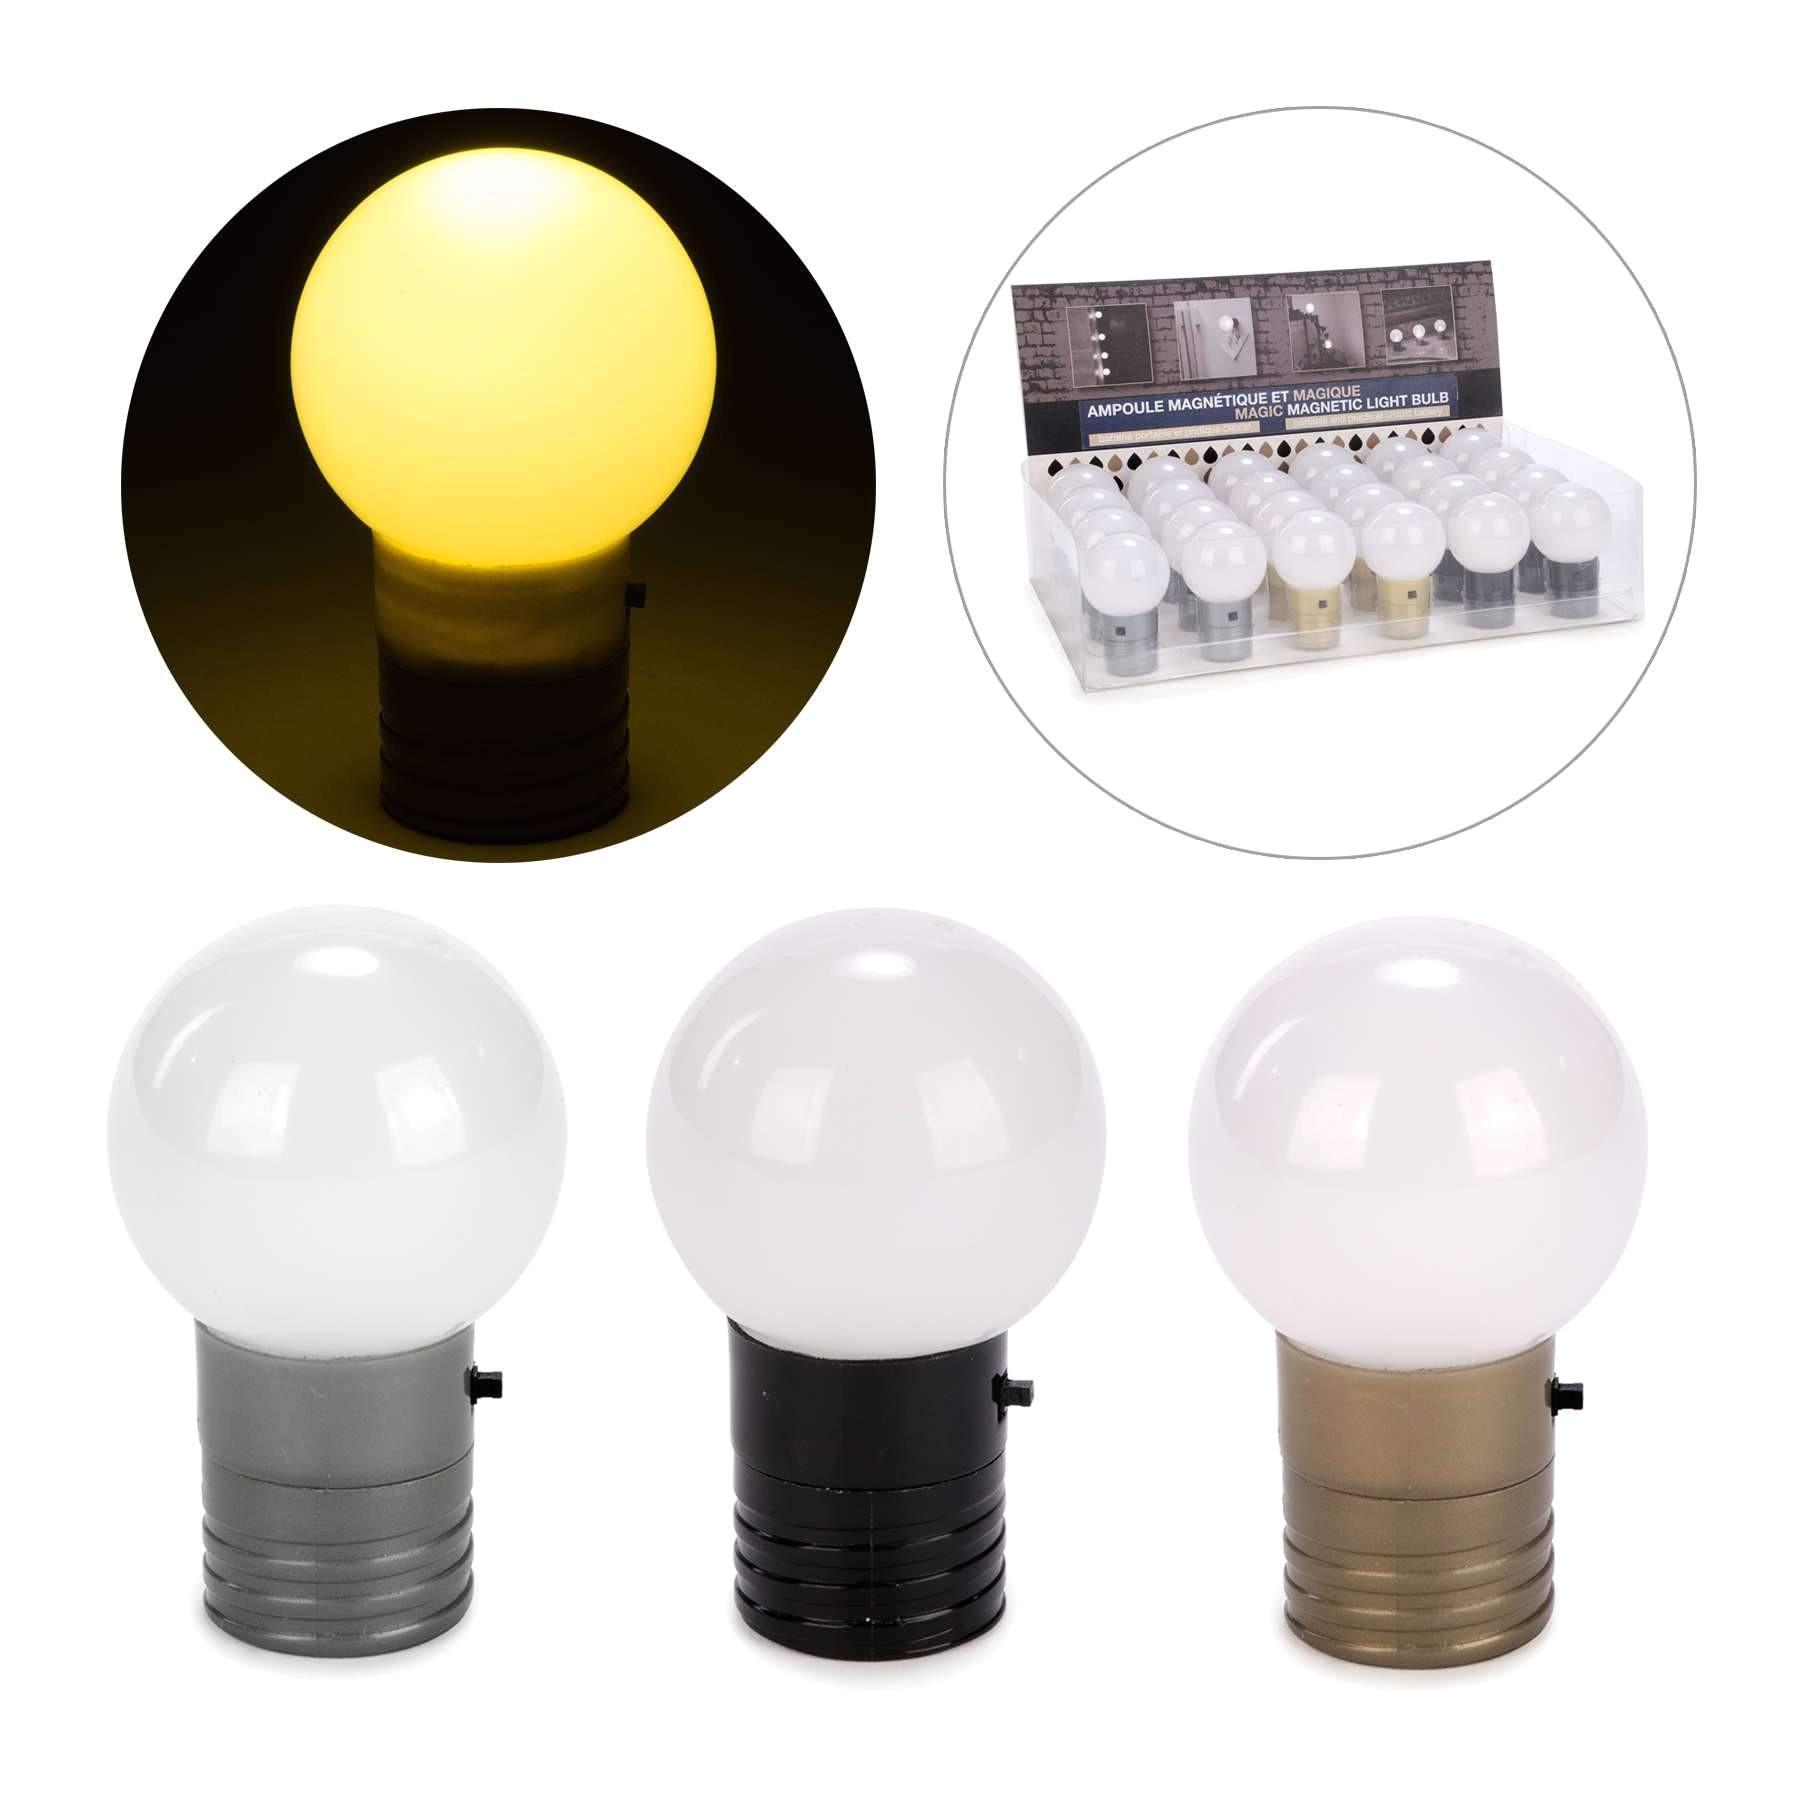 ampoules led decoratives inspirant decorative led magnetic bulb nautico deco of ampoules led decoratives beau